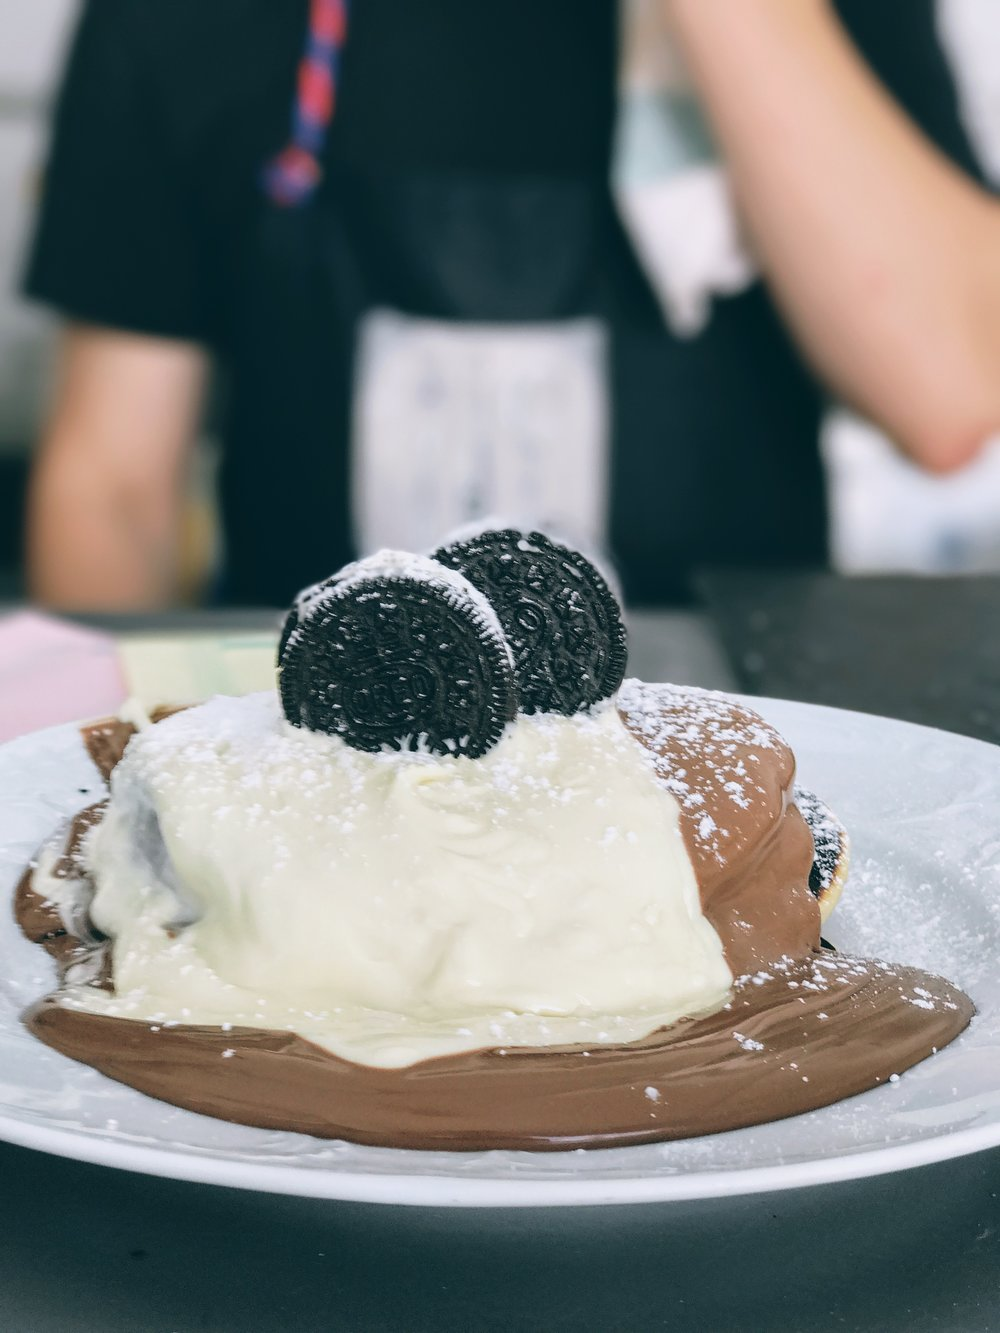 Oreo and white chocolate pancakes